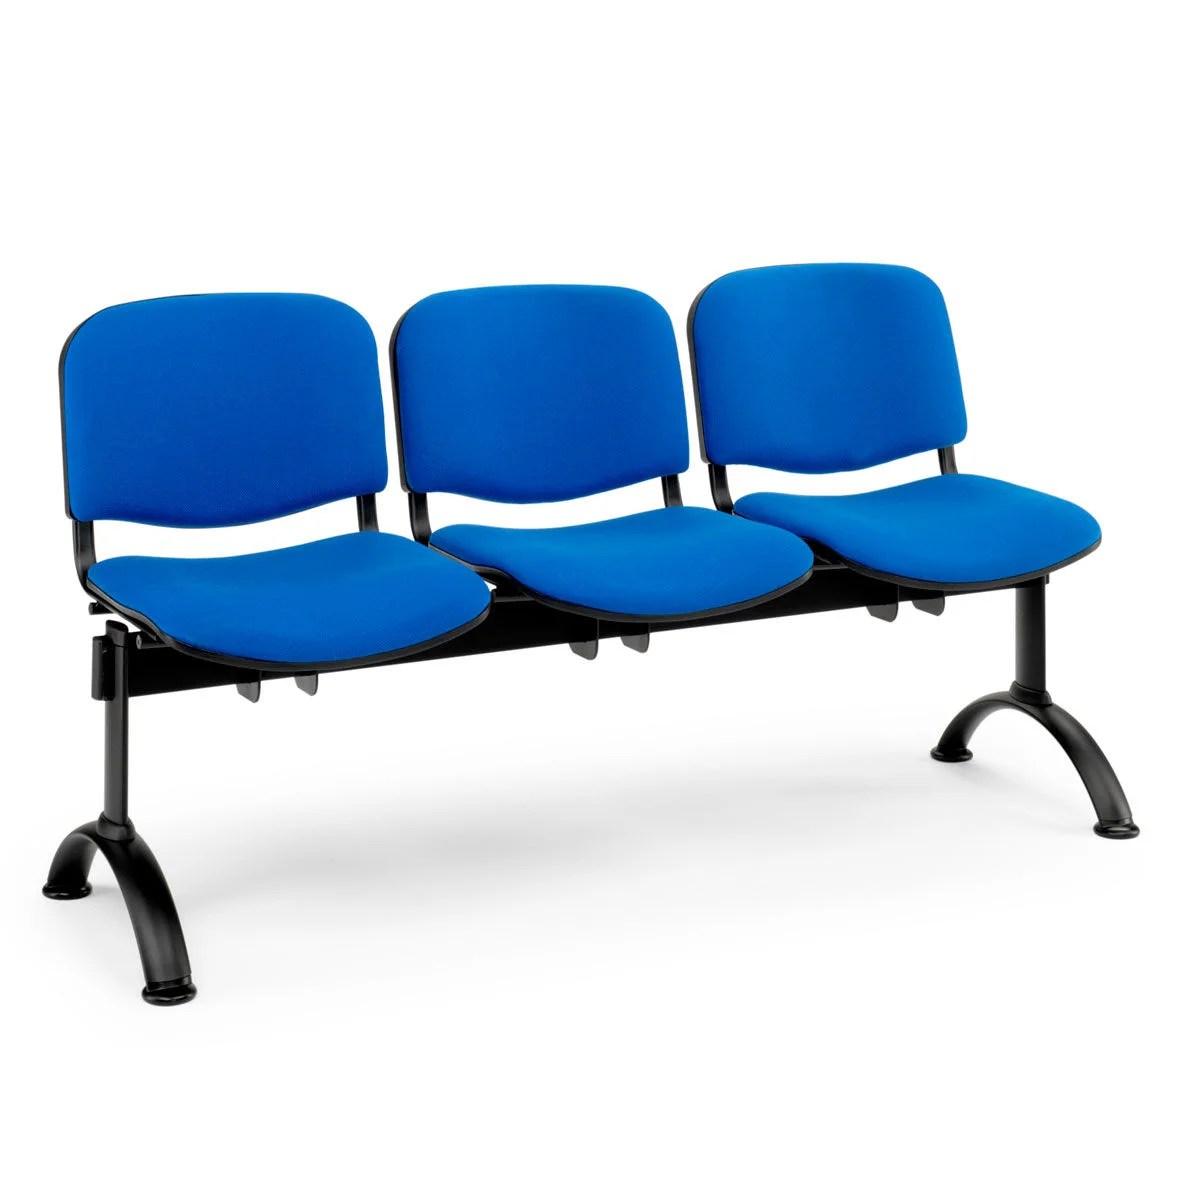 Sillas de despacho para sala de espera